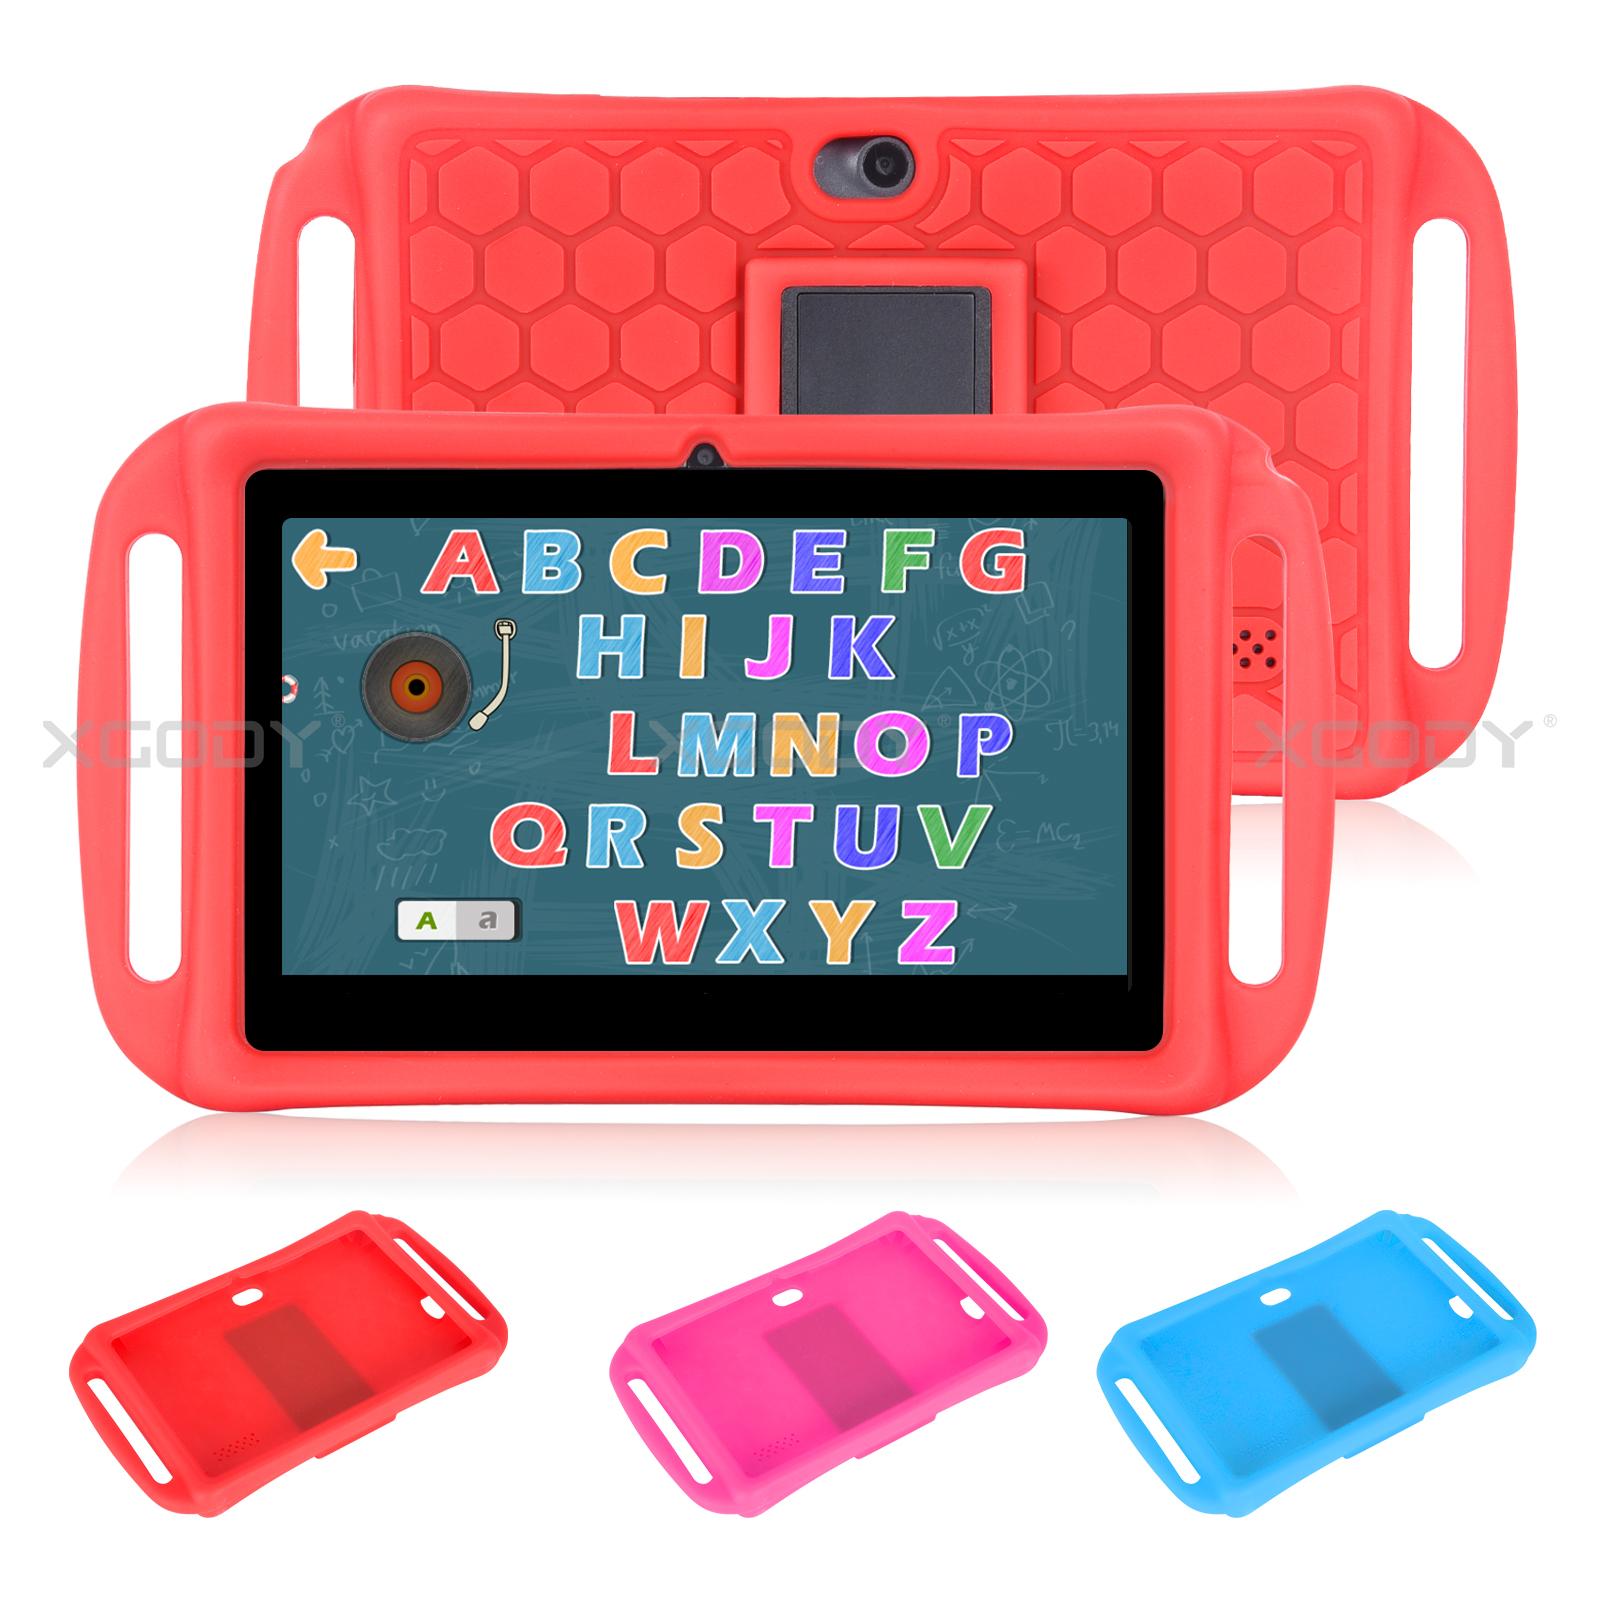 XGODY Tablet PC Kids Android 9.0 WiFi 2GB RAM 16GB ROM Quad